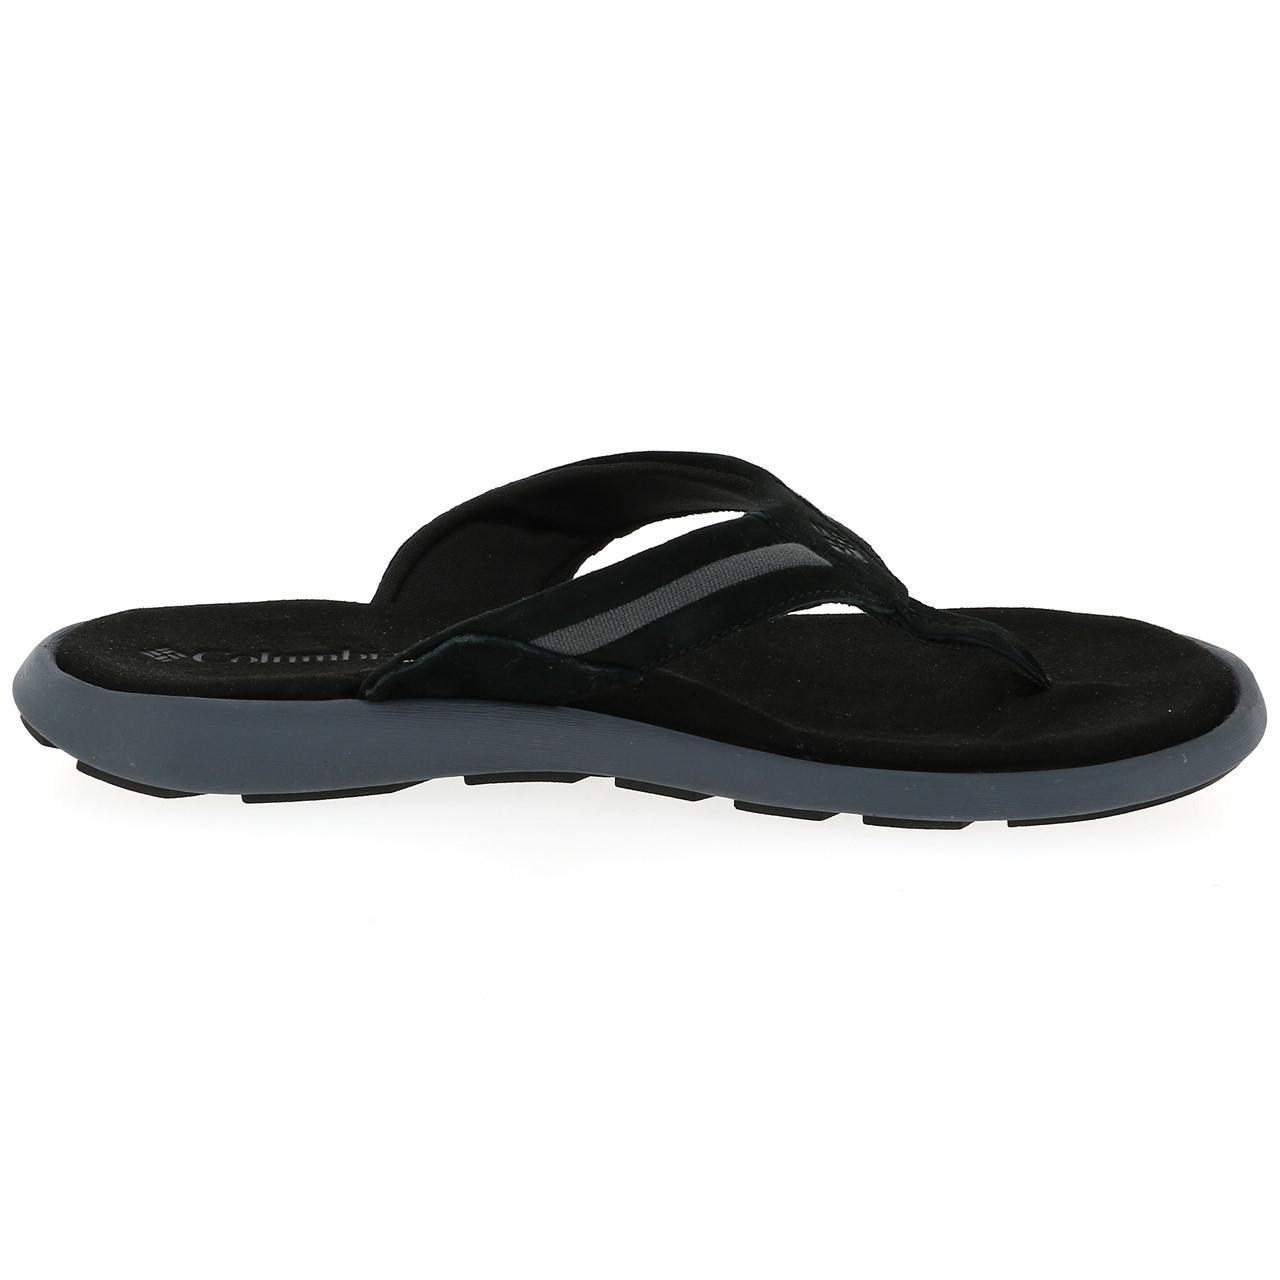 Flip-Flops-Tap-Dance-Shoes-Columbia-Verona-Black-Flip-Flop-Black-18113-New thumbnail 3